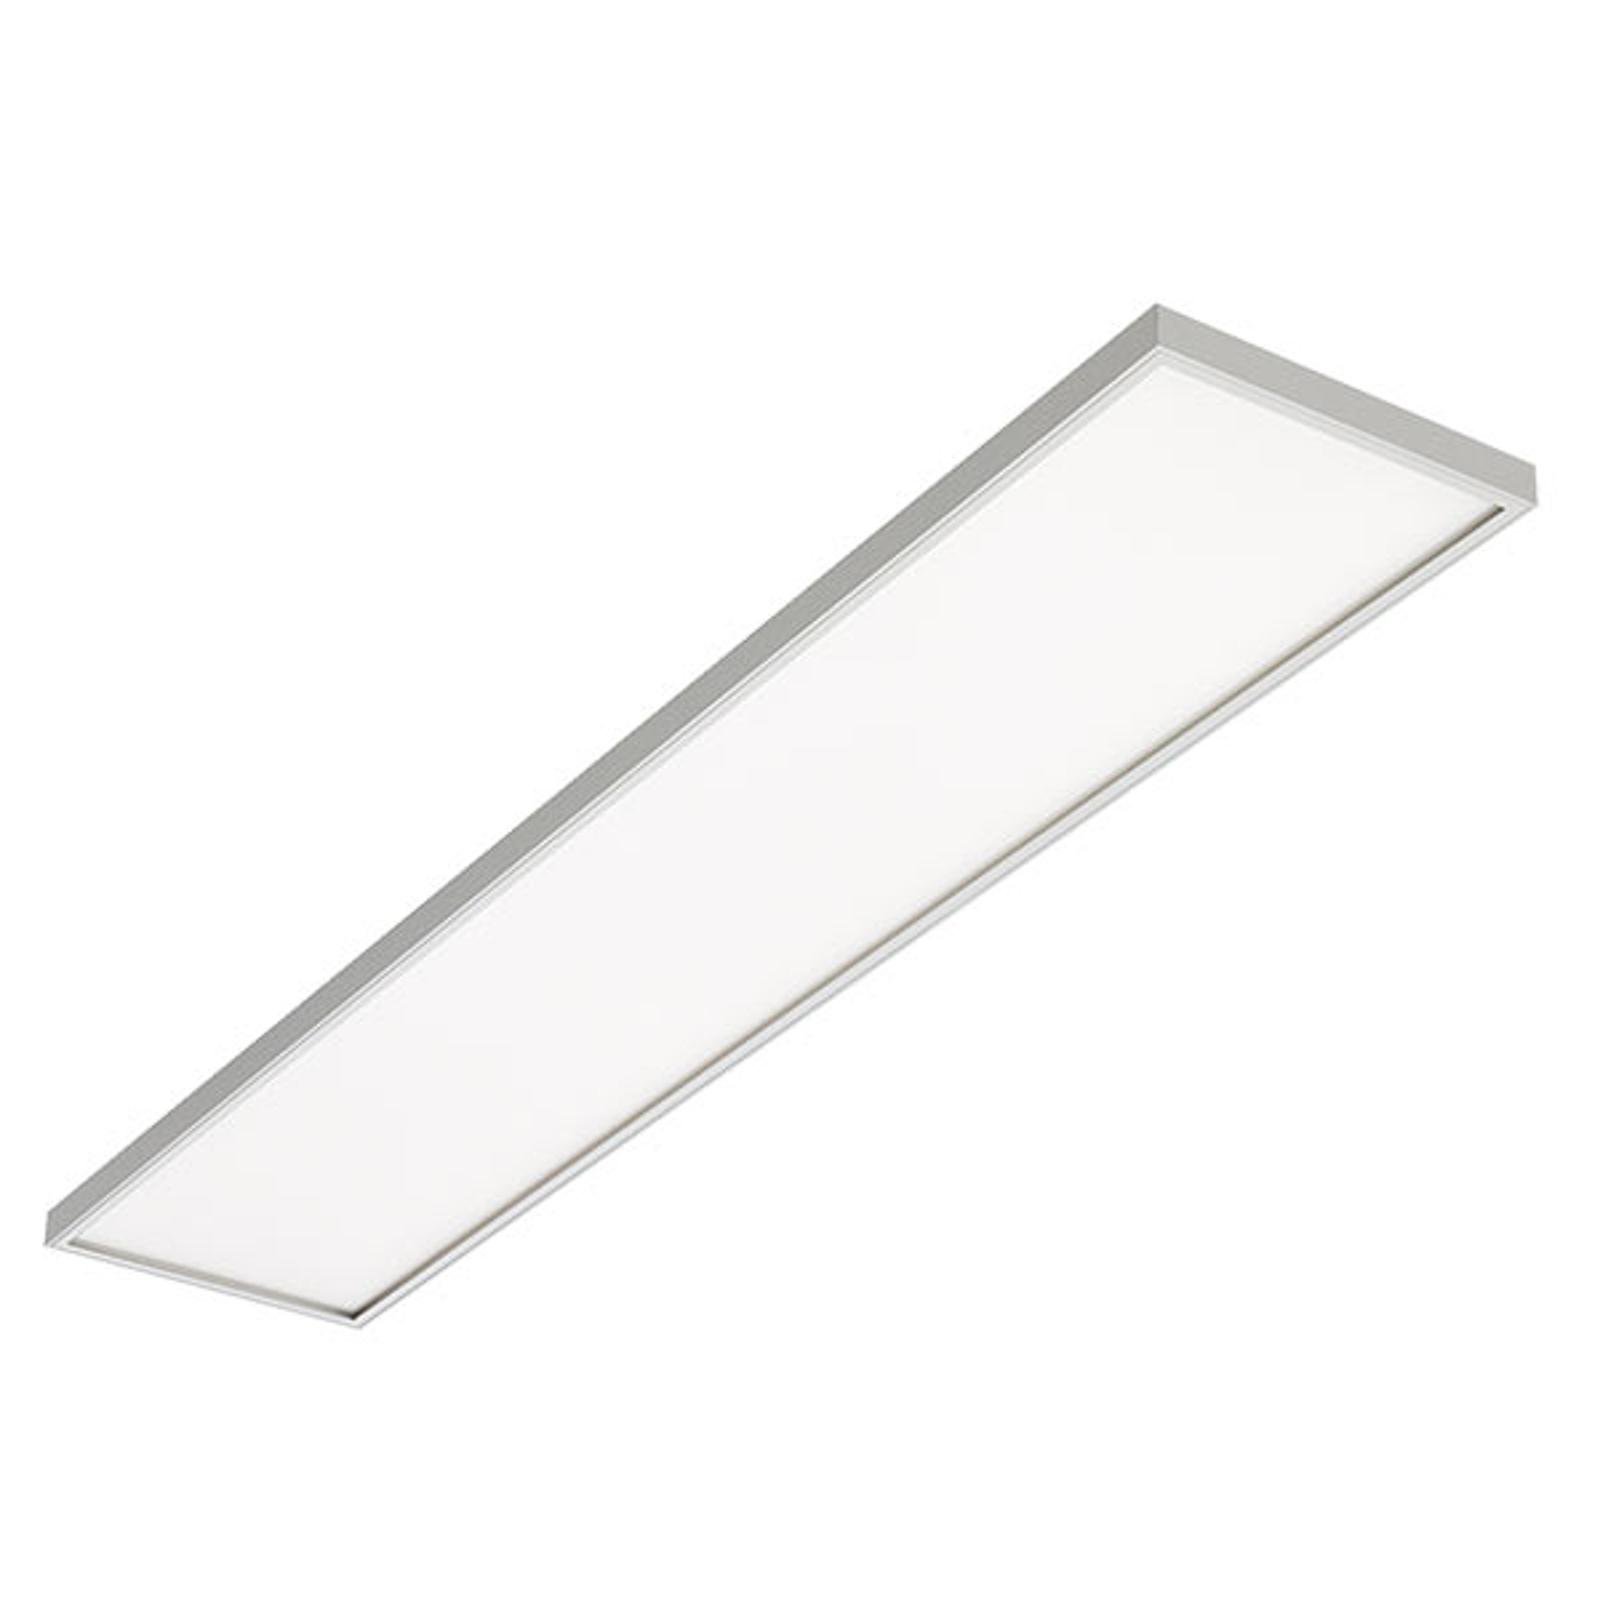 Lampa sufitowa LED C95-S 4000 HF, mikropryzmat